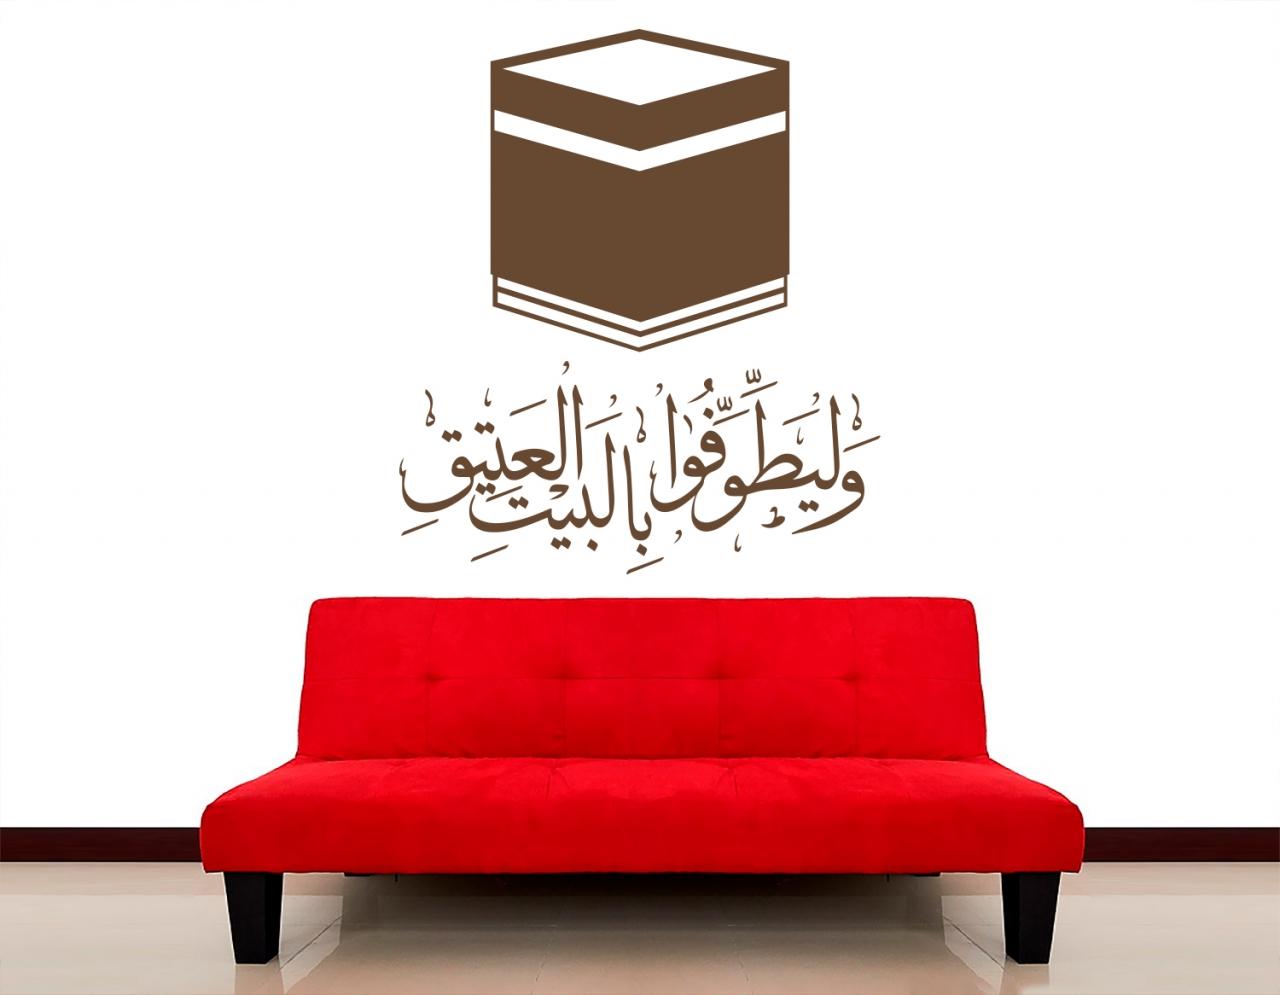 Kaaba Mekka Wandtattoo Mit Koran Verse Verziert #4